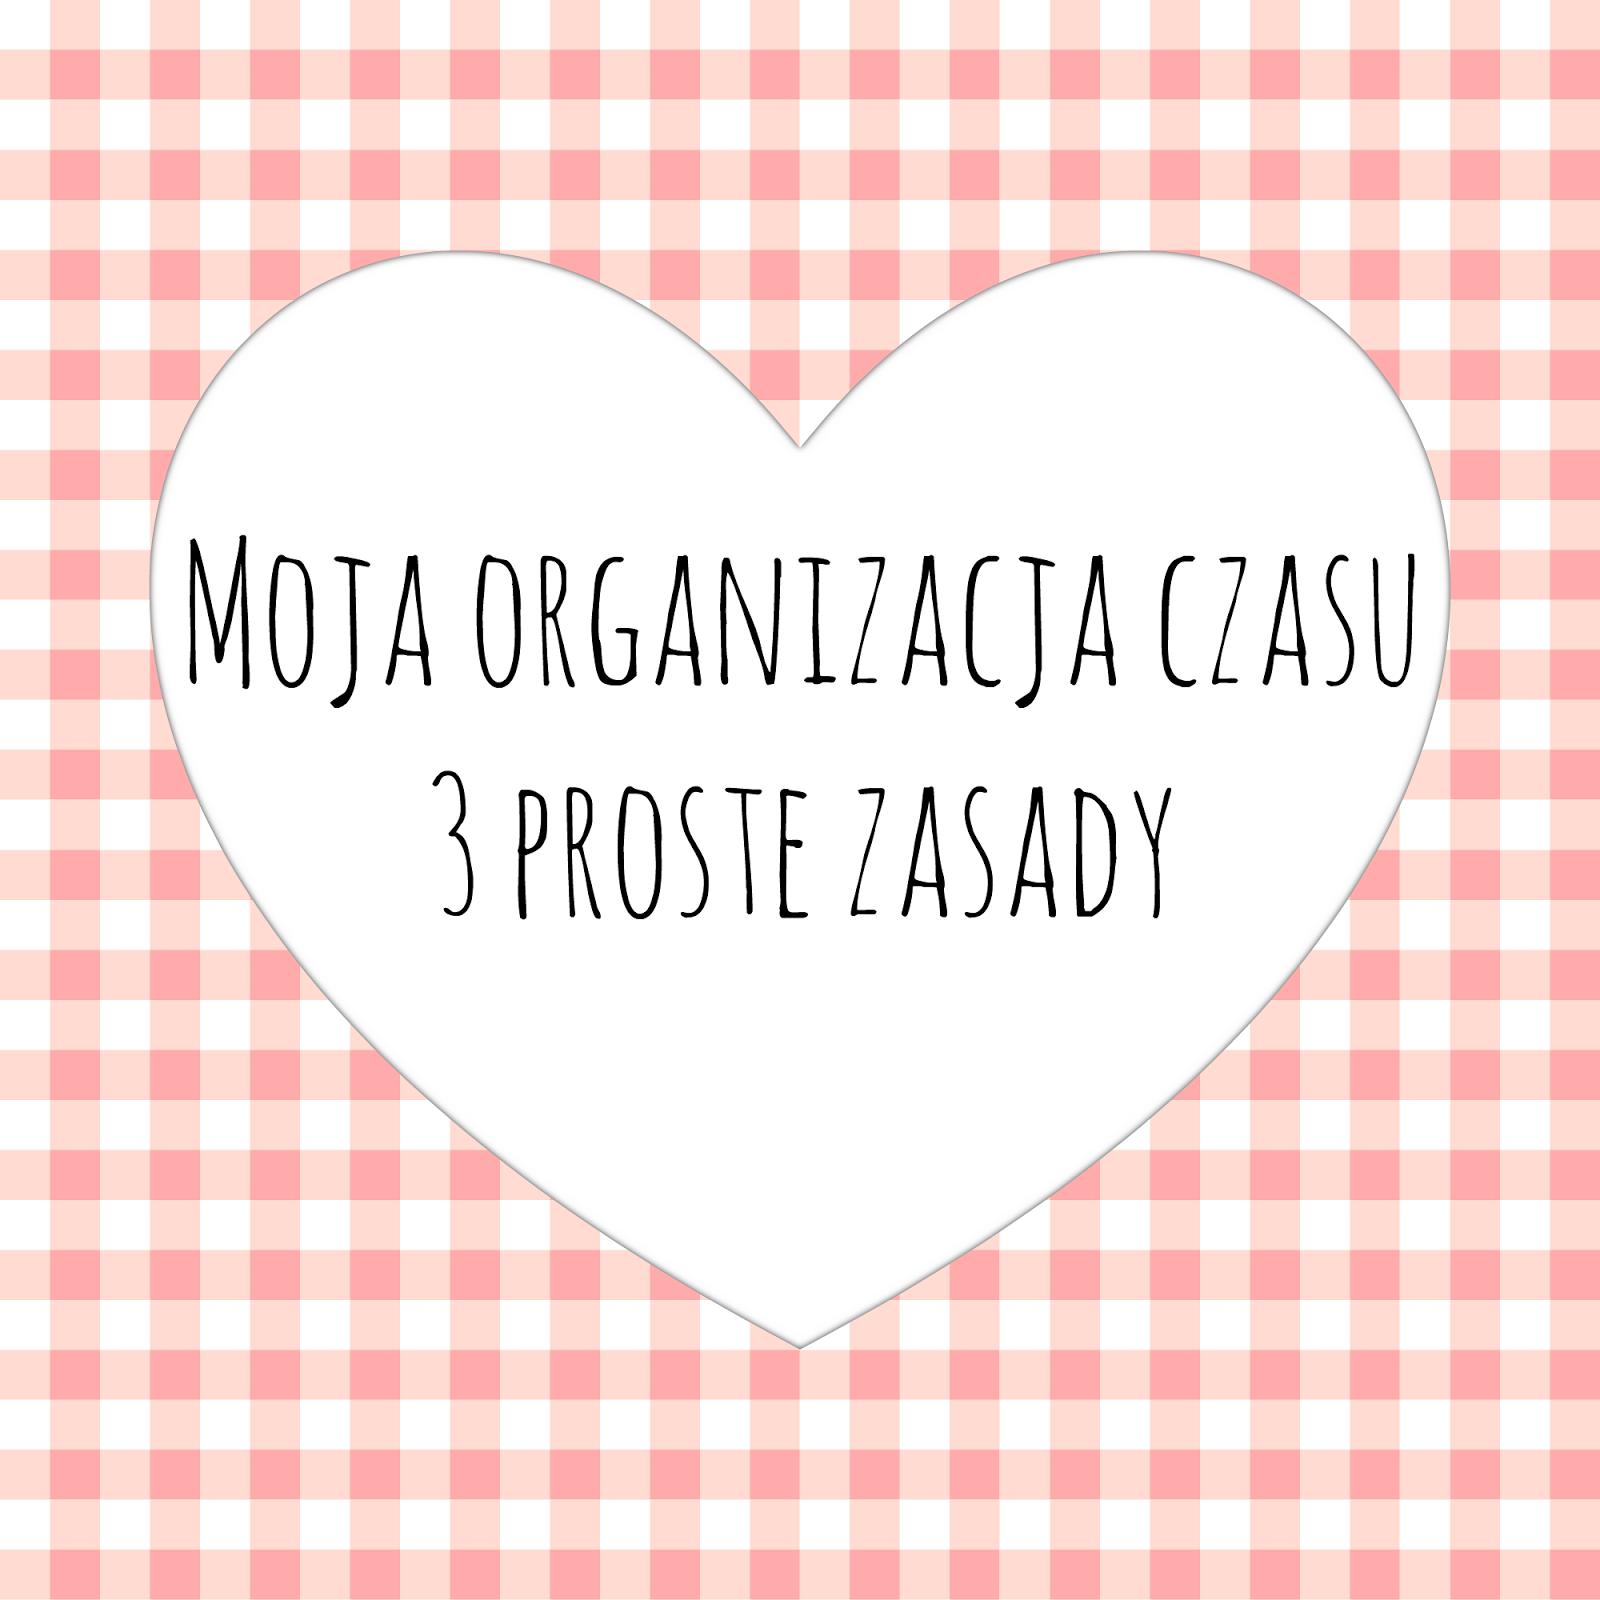 http://raisin1989.blogspot.de/2014/04/moja-organizacja-czasu-3-proste-zasady.html